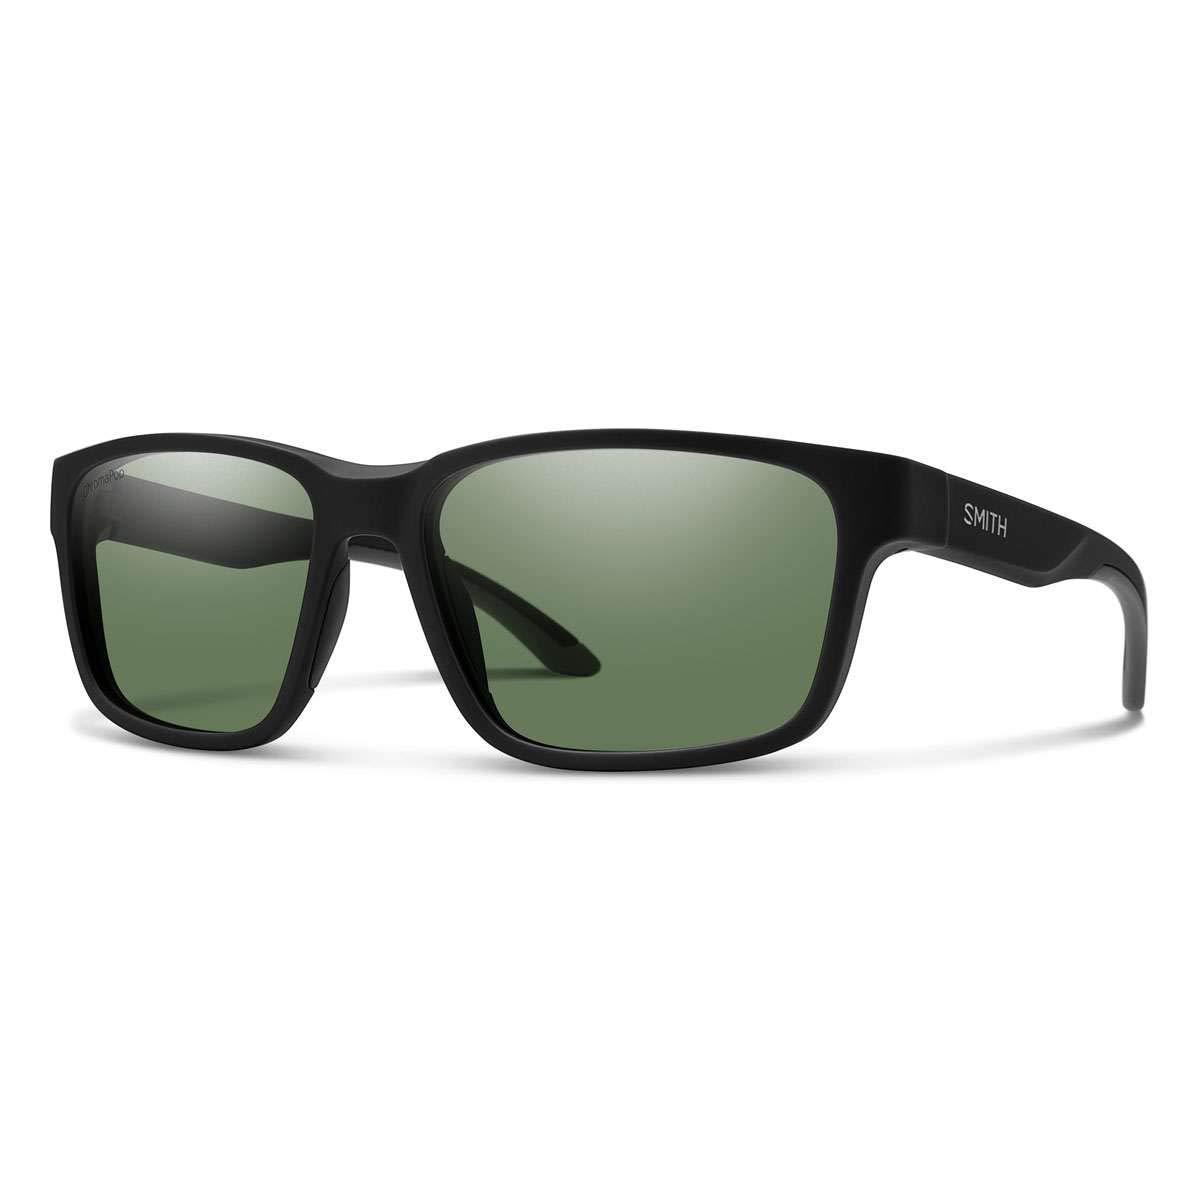 Smith Optics Basecamp ChromaPop Polarized Sunglasses 20192900359L7